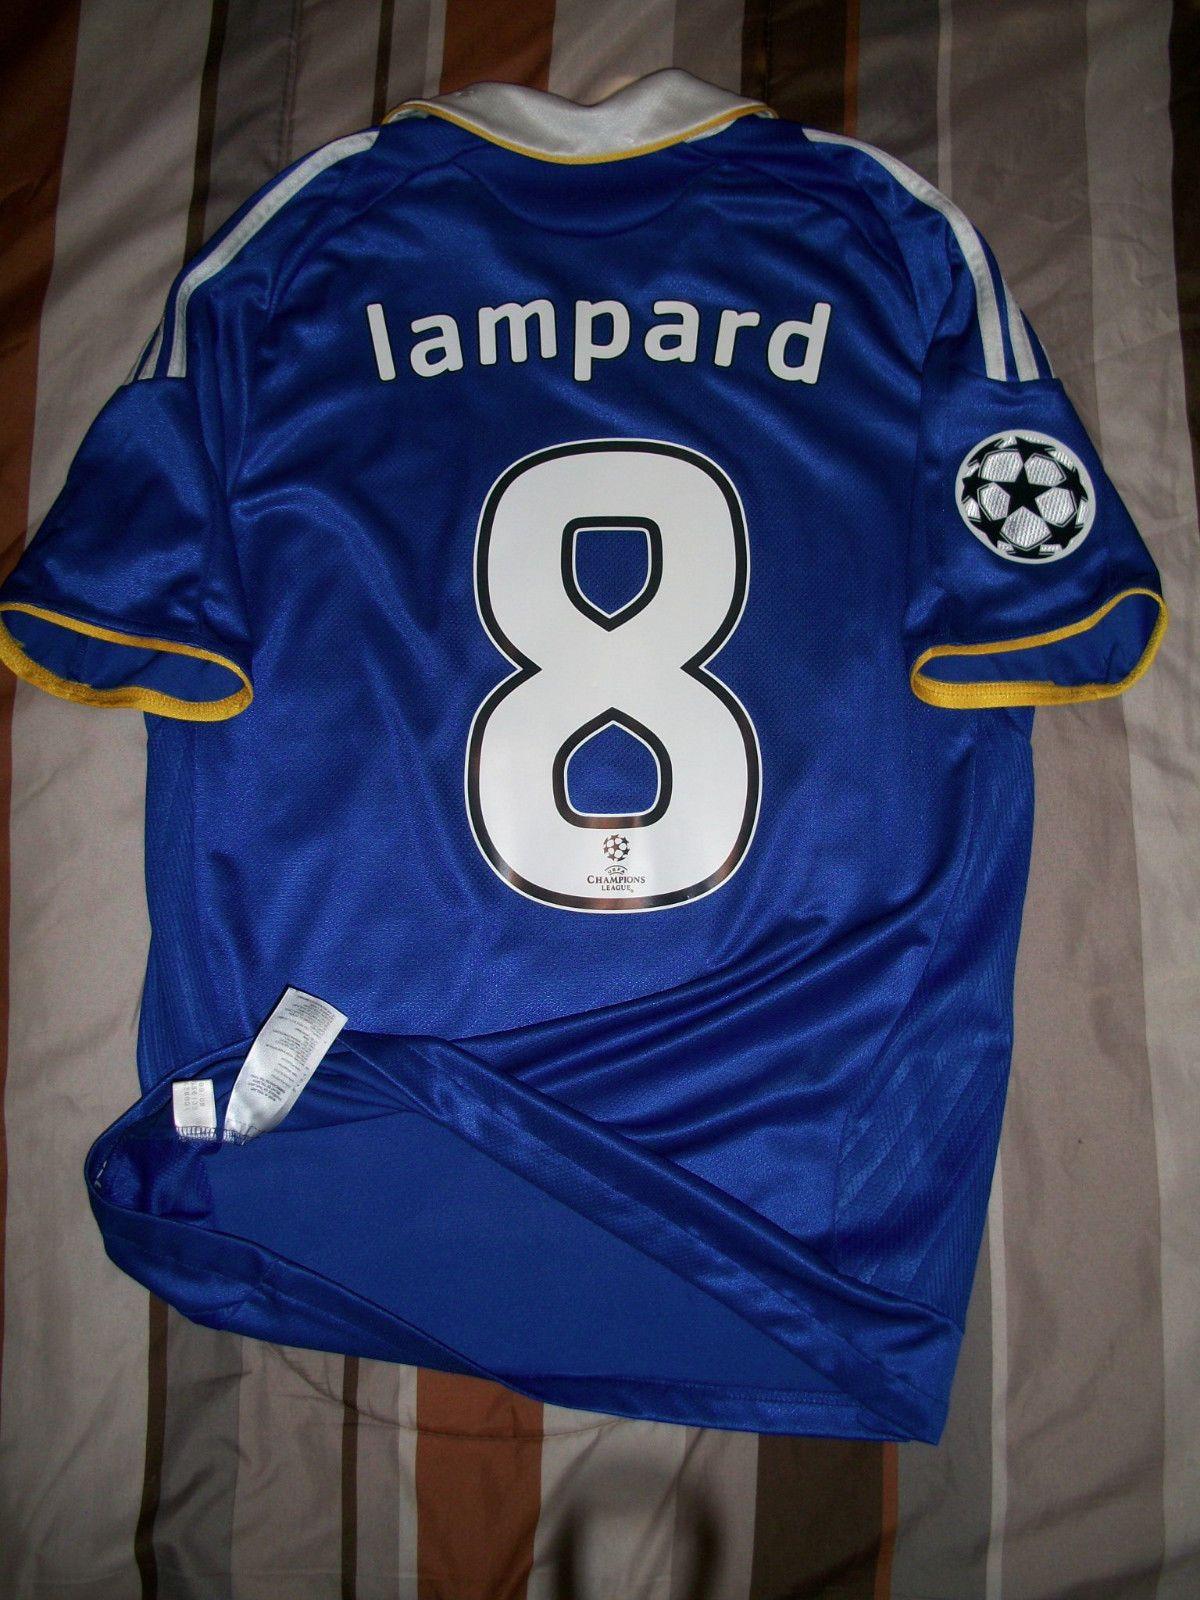 RARE Adidas Chelsea FC Home Soccer Football Jersey 2007 2008 Lampard please  retweet a19e50a4f